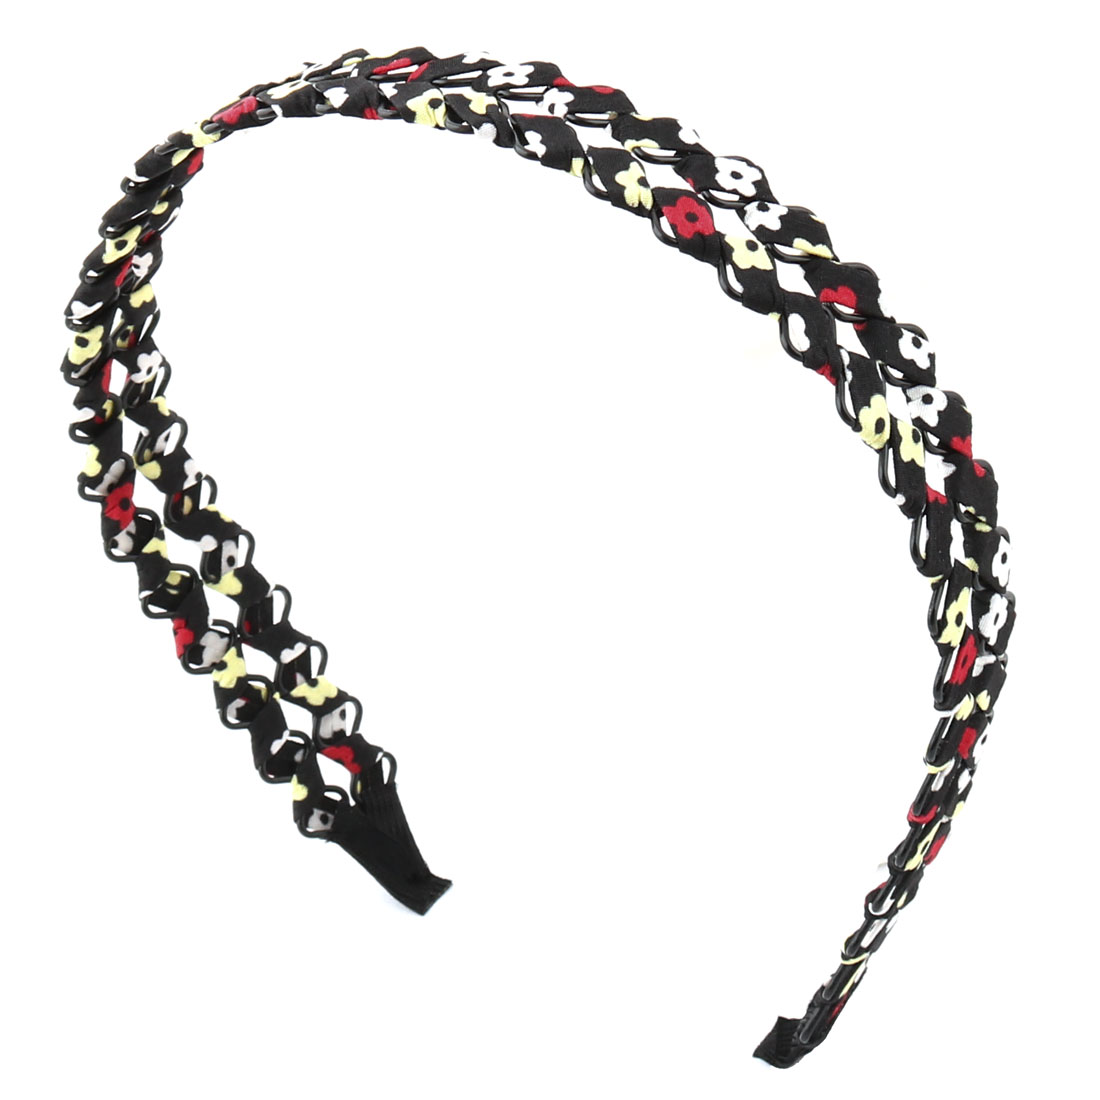 Woman Lady Fabric Overlapped Braided Flower Pattern Broadside Hair Hoop Headband